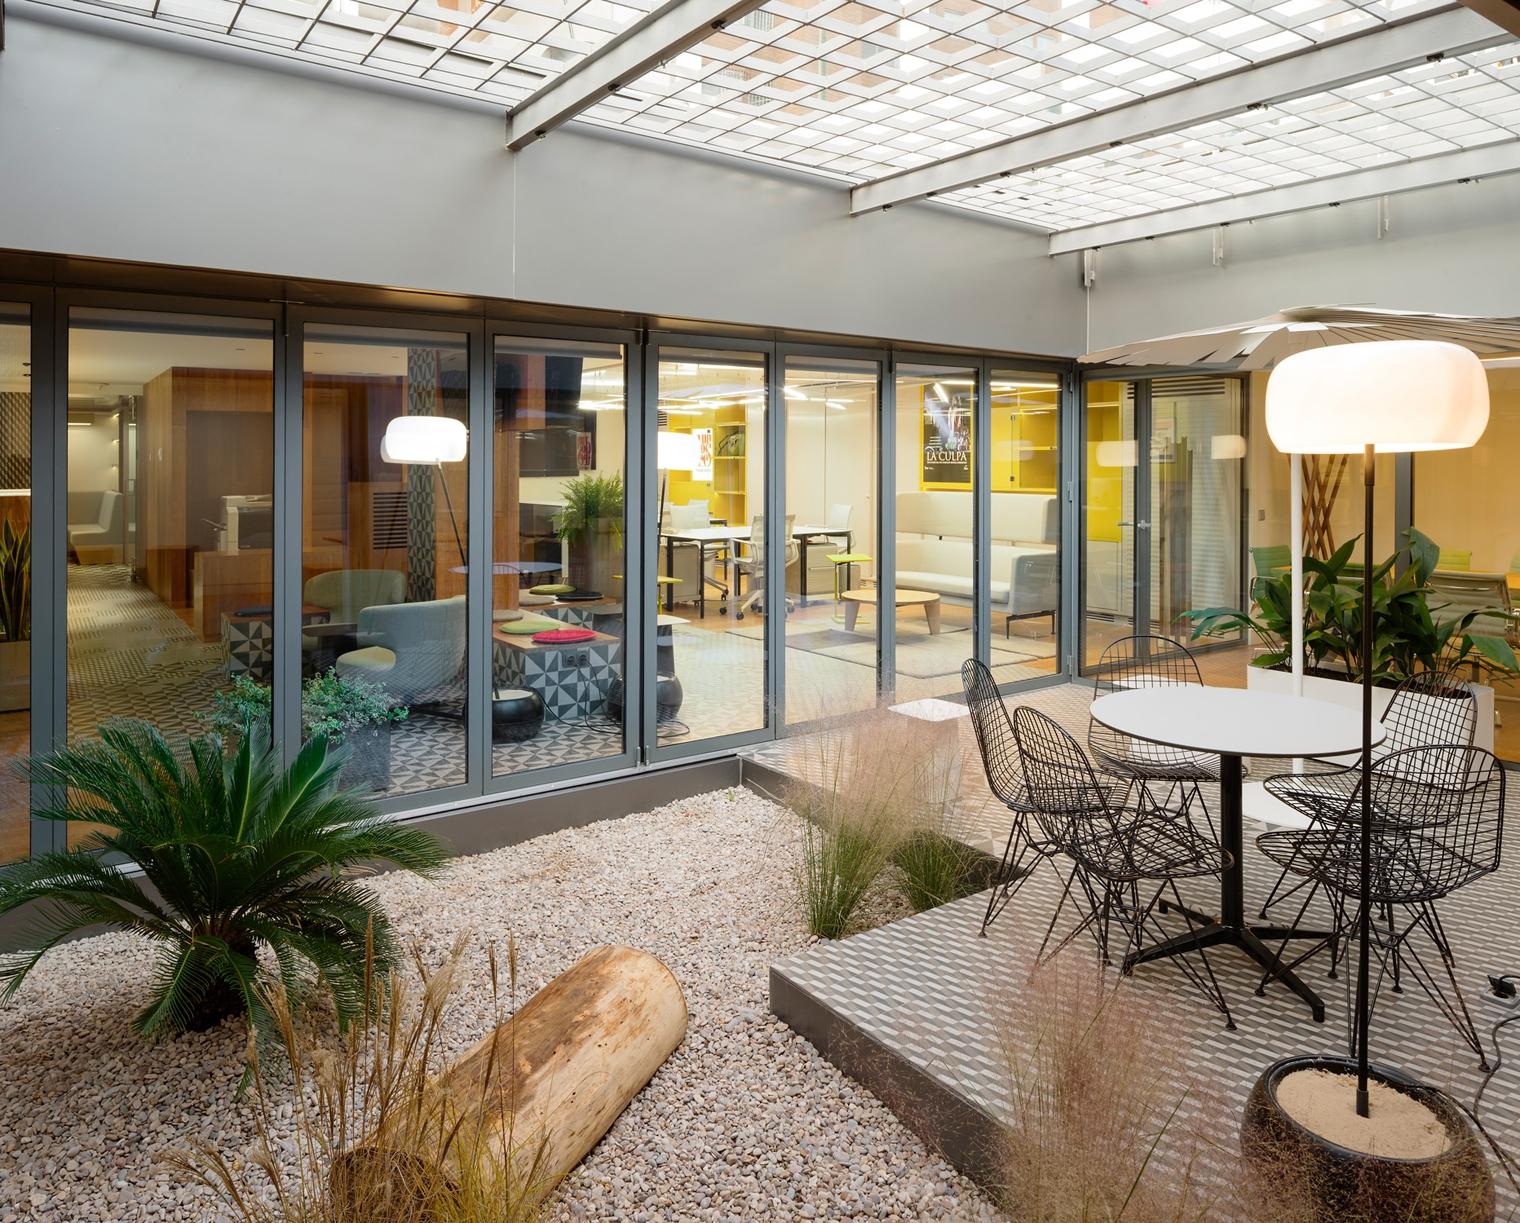 Agi architects dise a las oficinas de chicho ib ez for Oficinas prosegur madrid